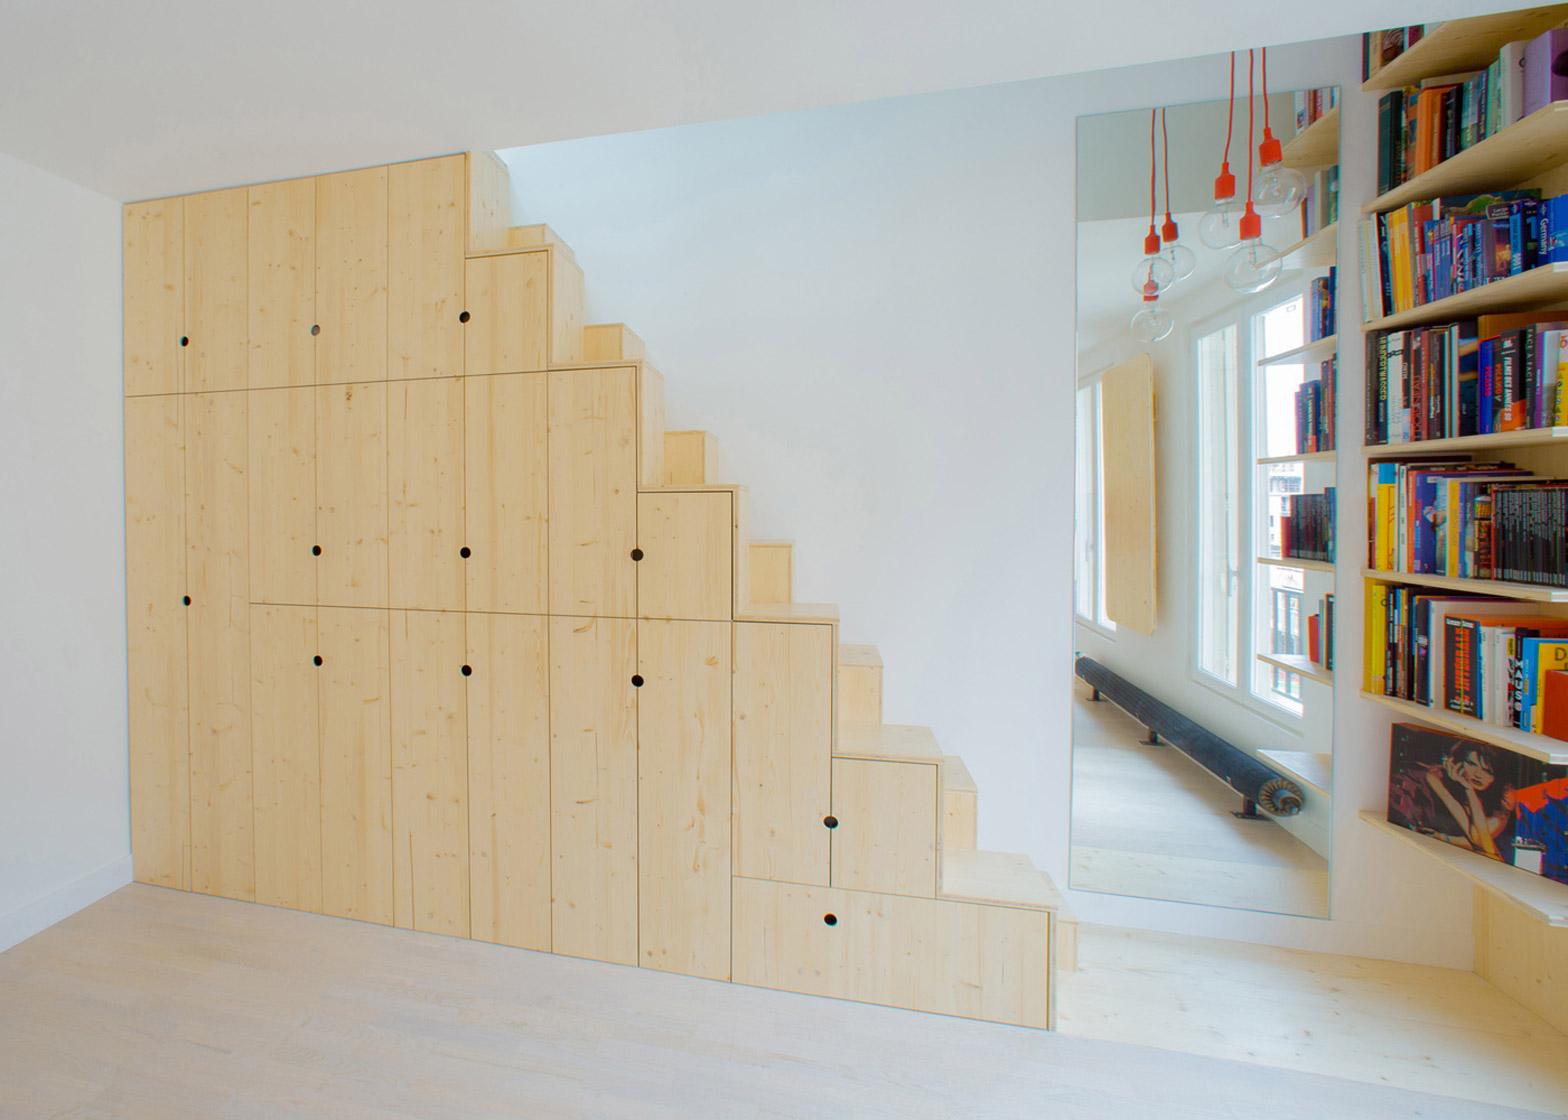 architecture_10_compact_solutions_design_studia_interiors_osnovadesign_osnova_poltava_05